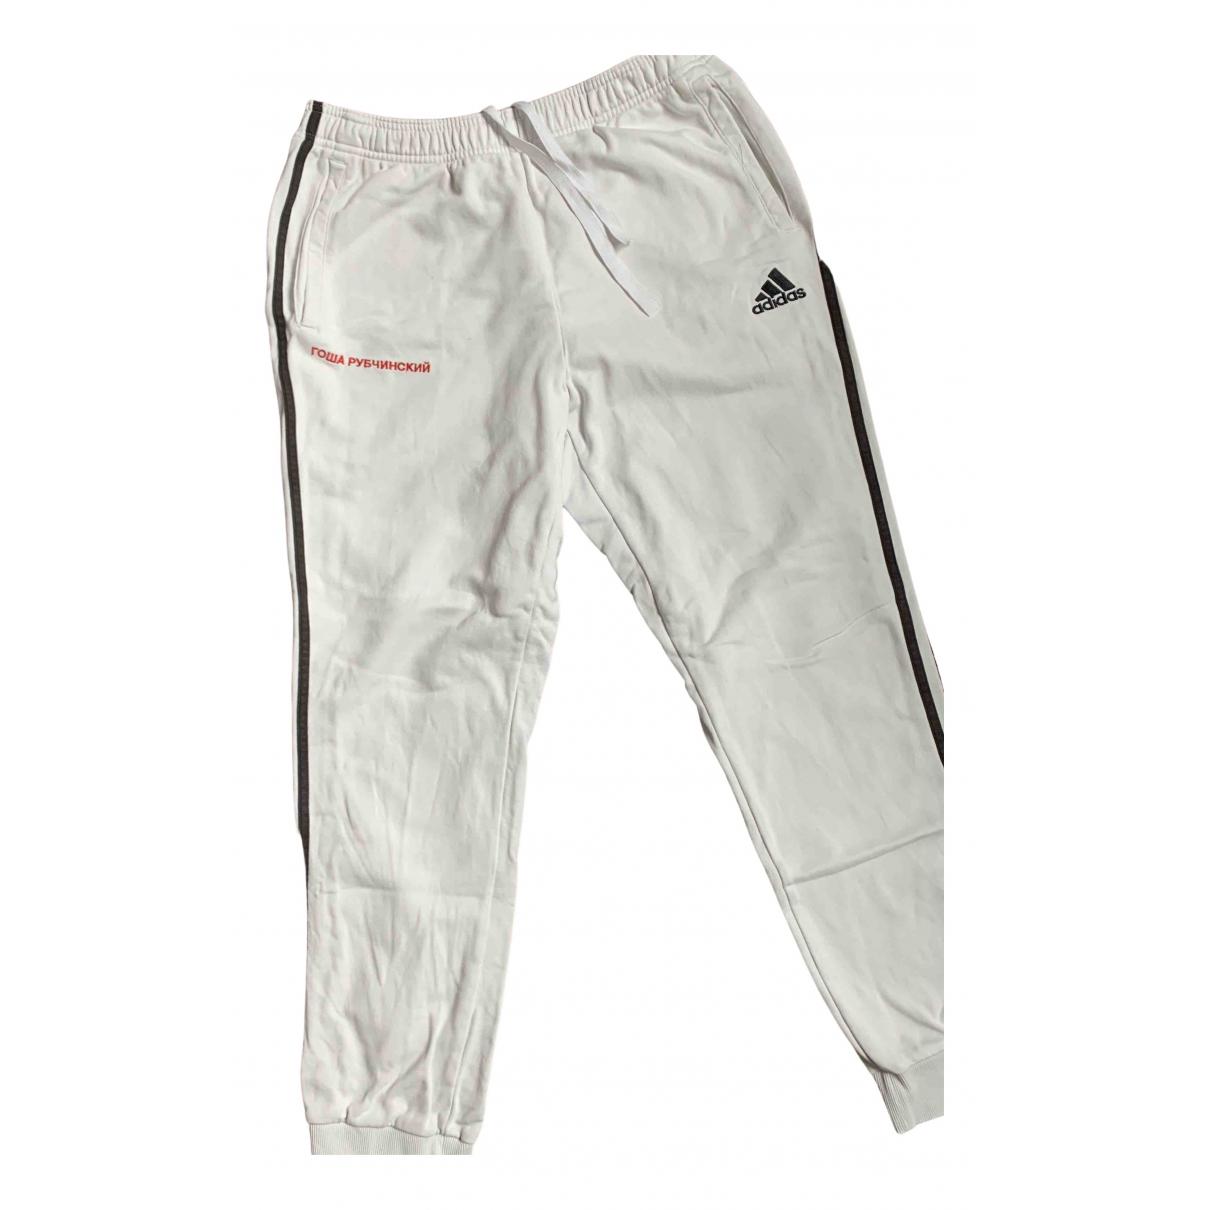 Adidas X Gosha Rubchinskiy N White Cotton Trousers for Men L International